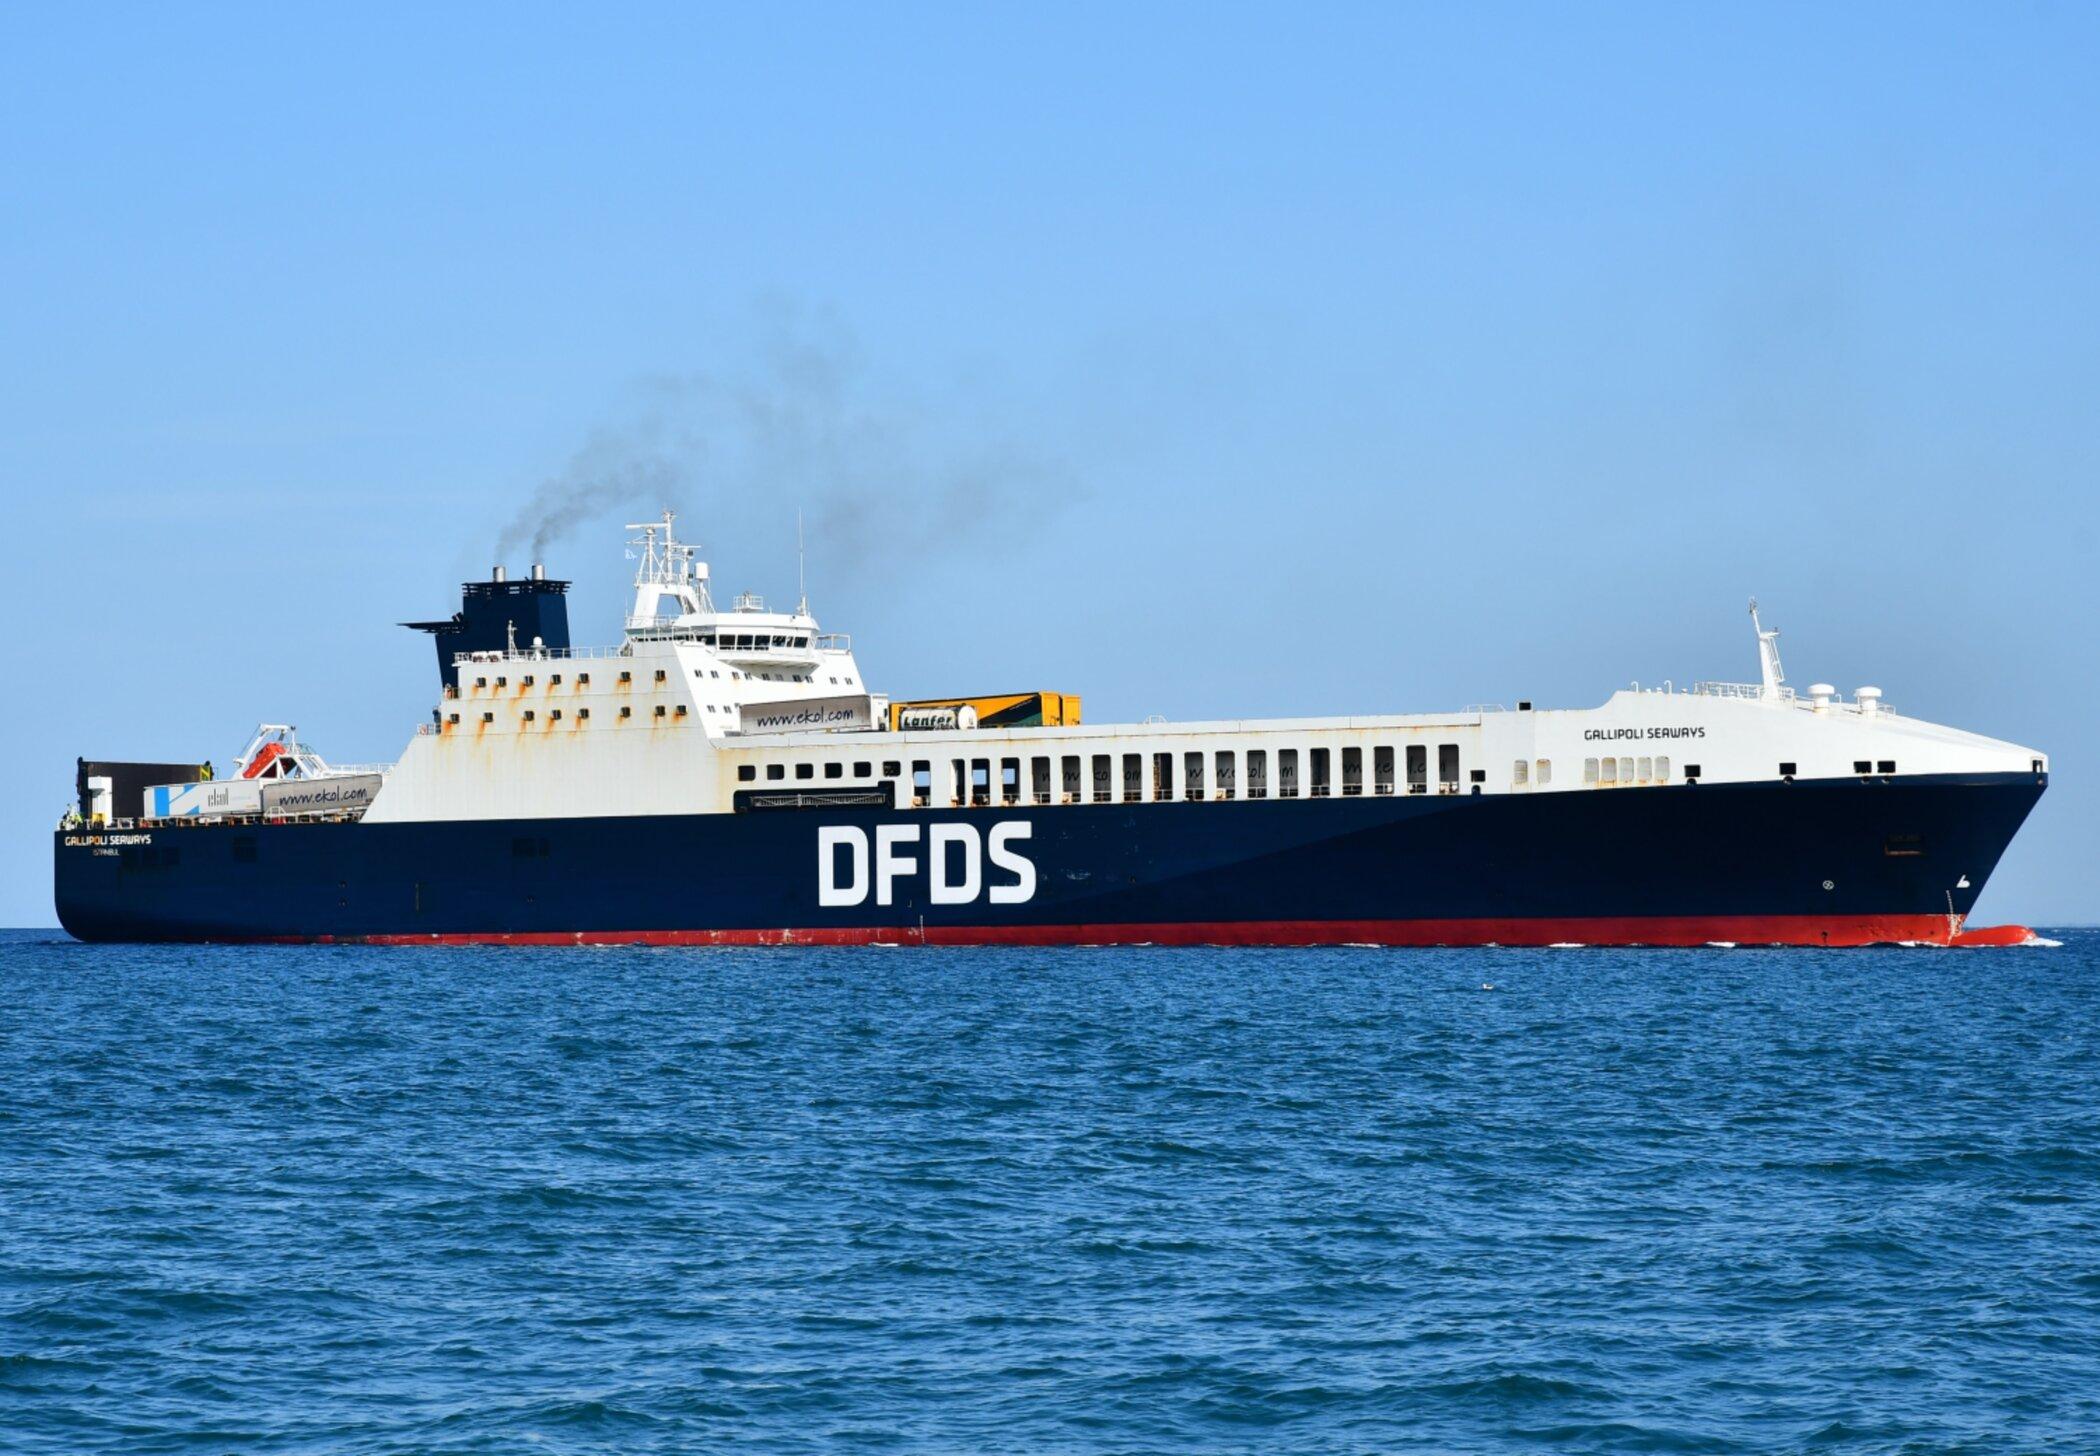 Gallipoli Seaways_28-05-21_Patras